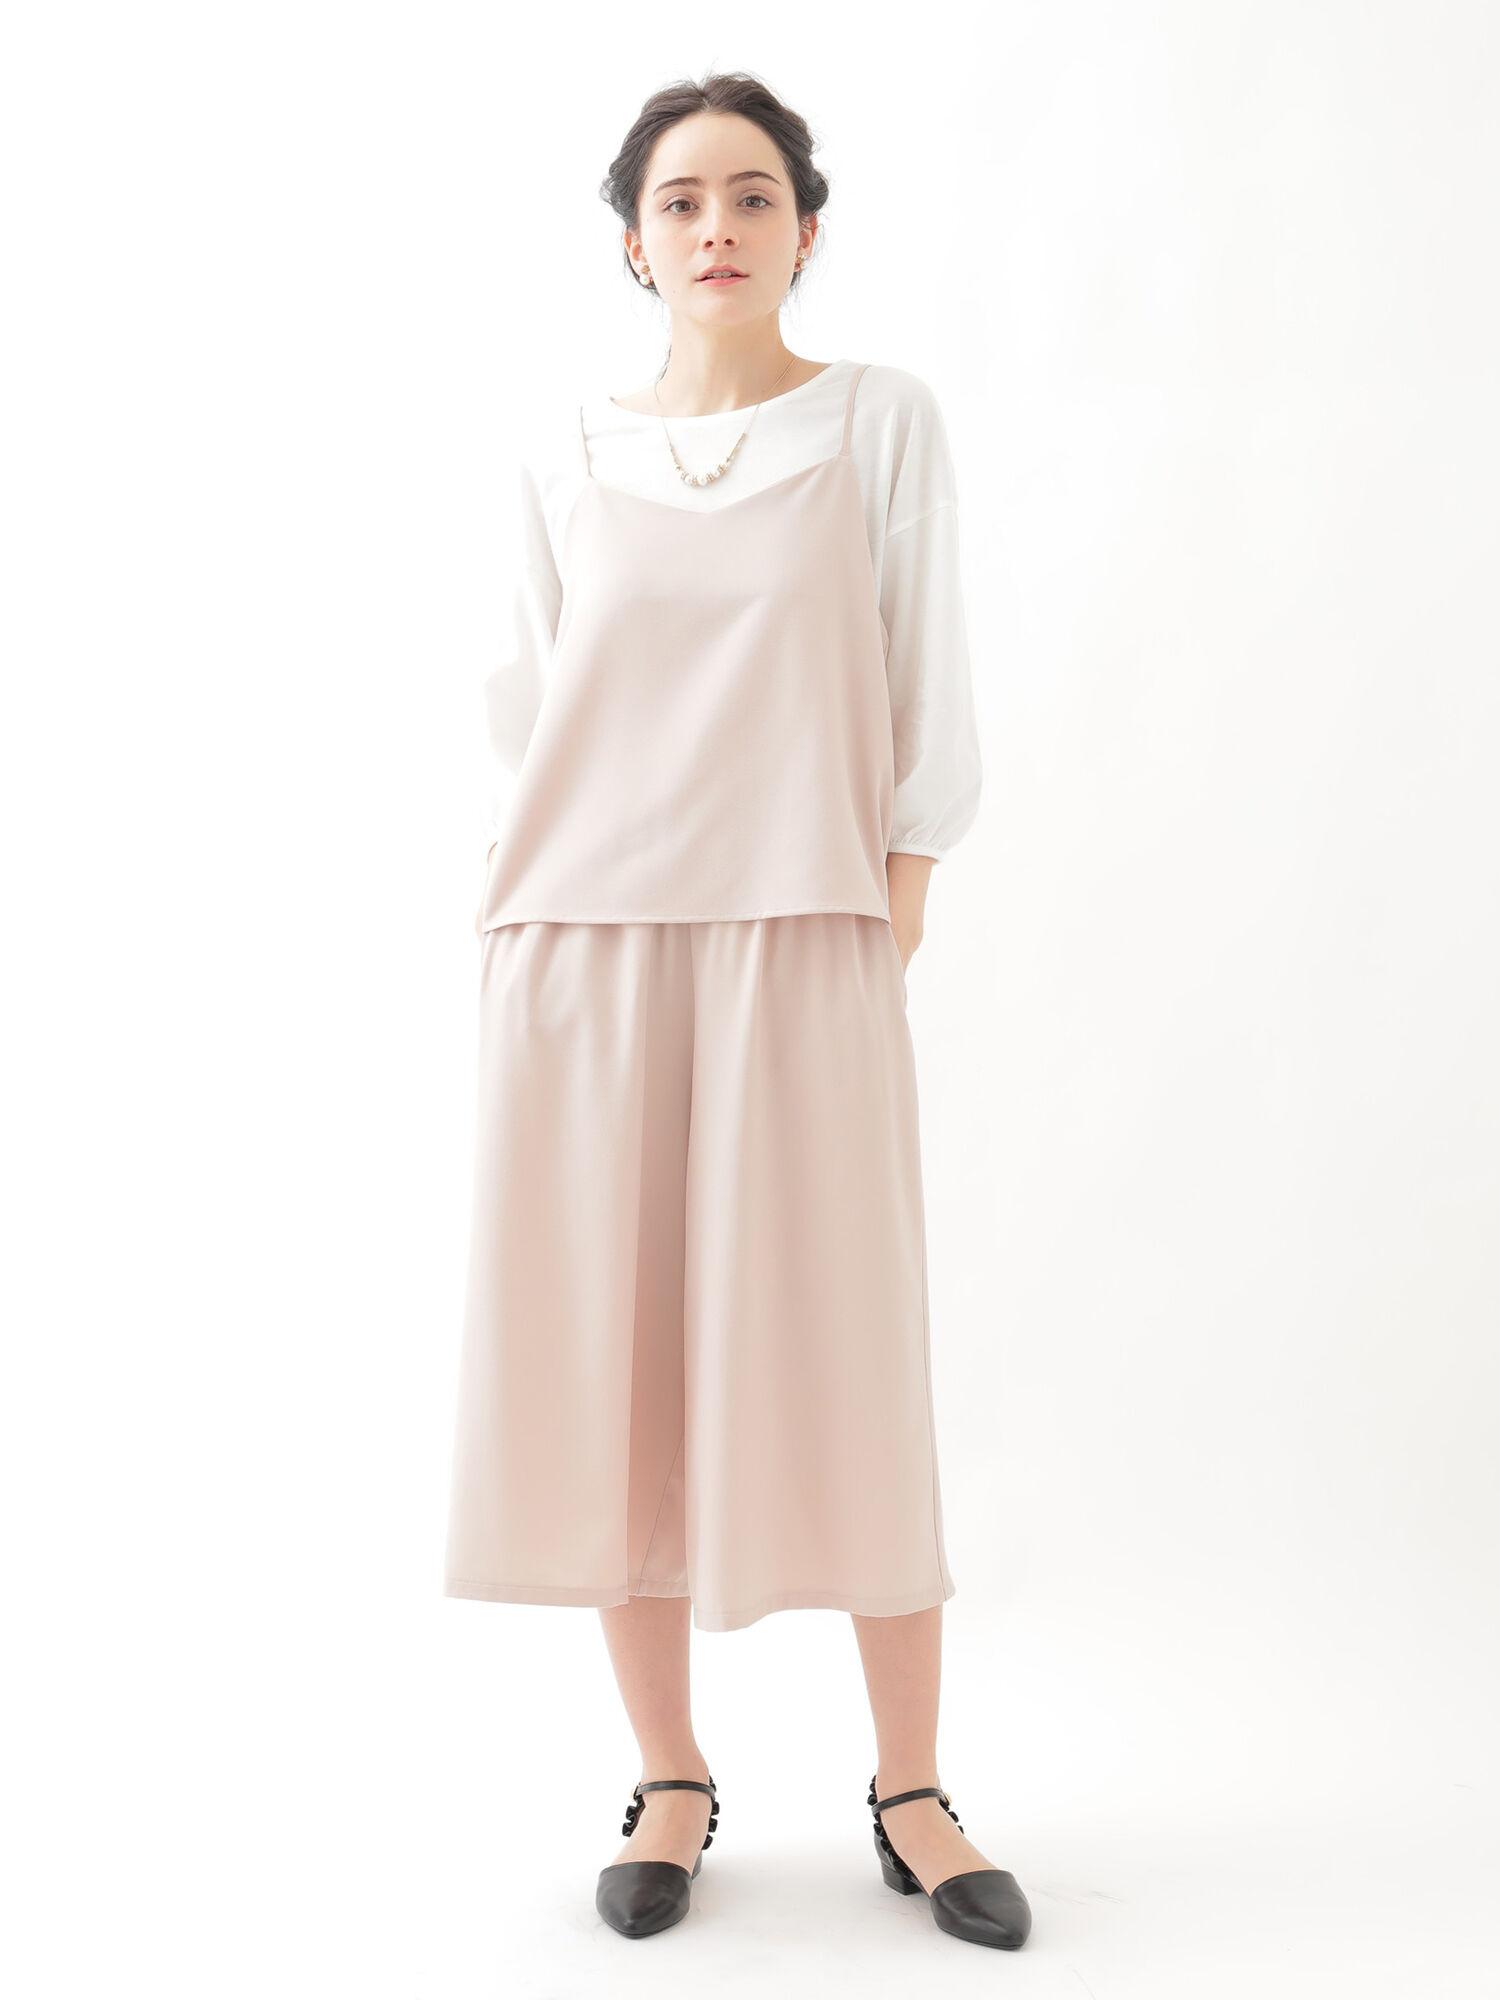 【SETITEM】・キャミソール+スカーチョ+プルオーバーセット